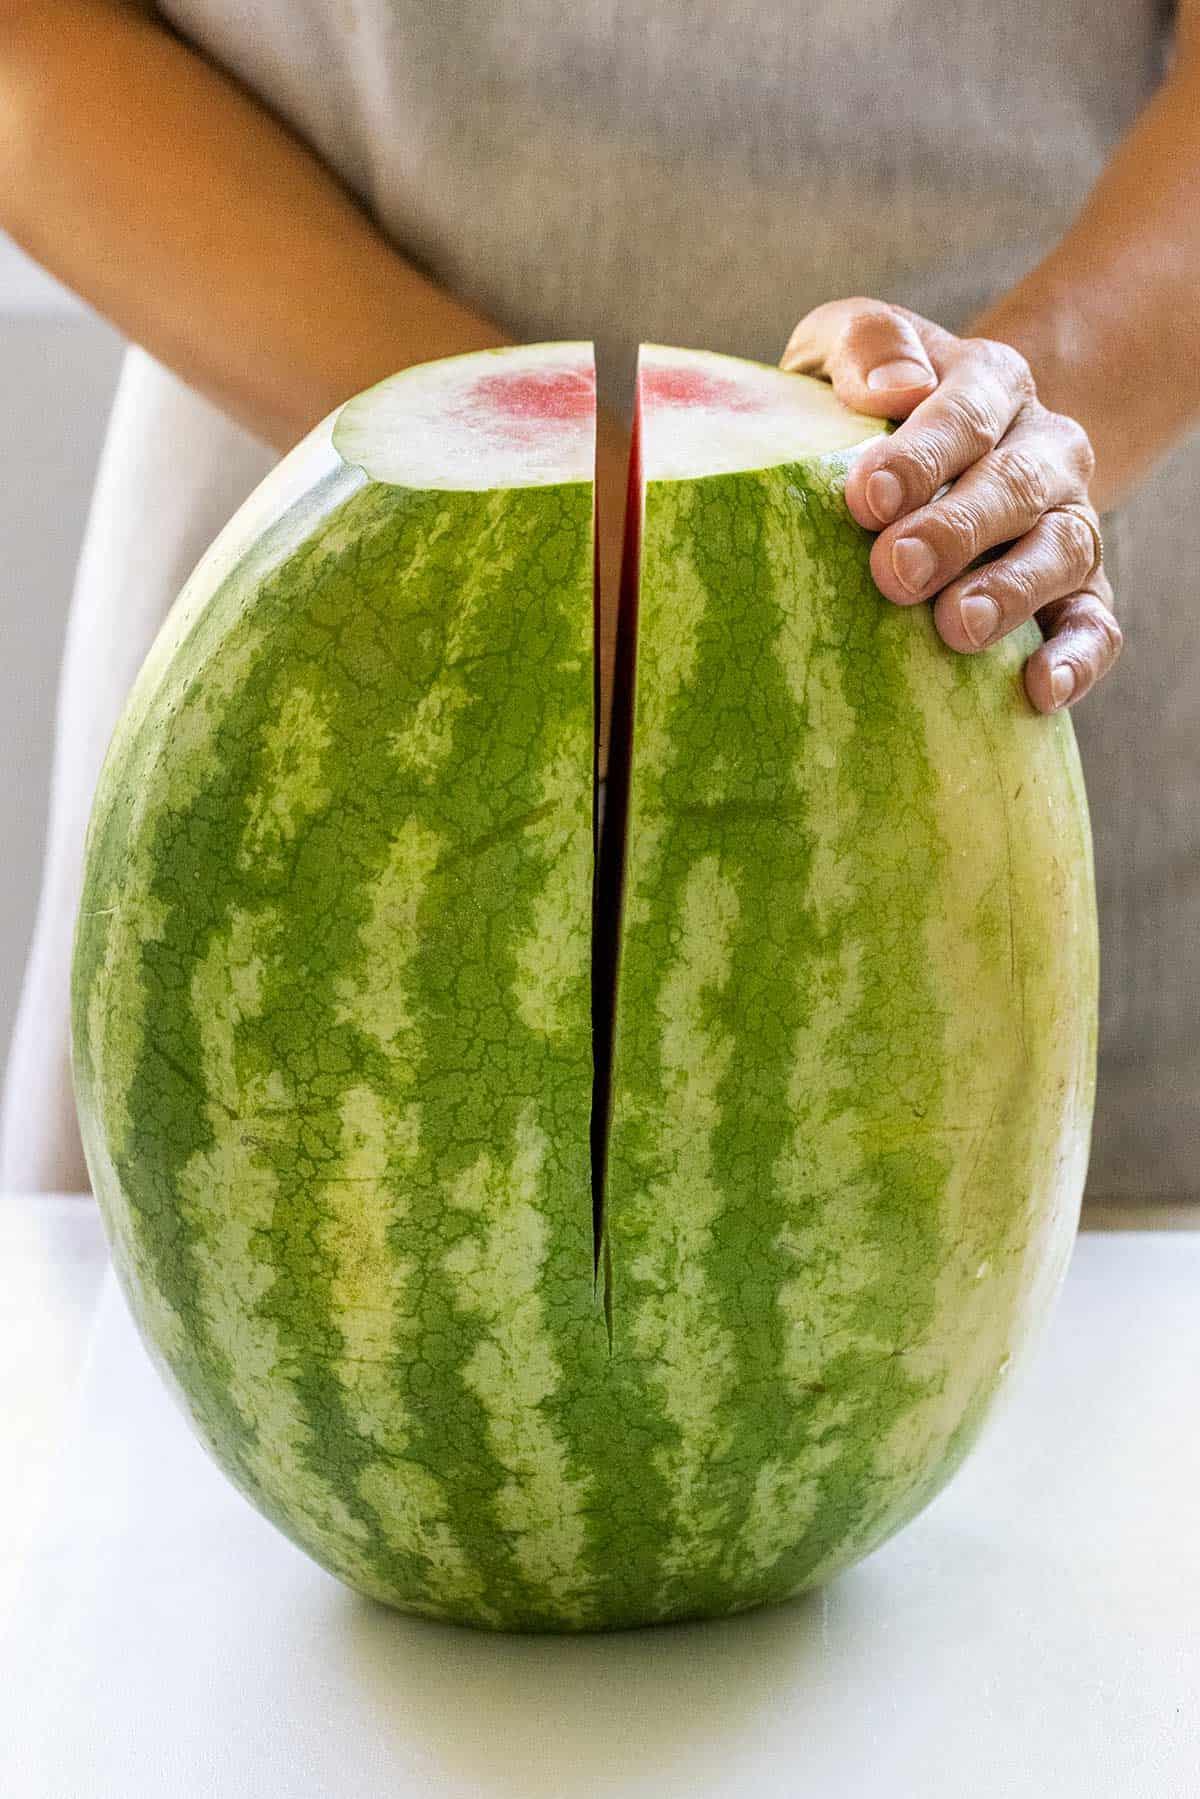 slicing a watermelon in half